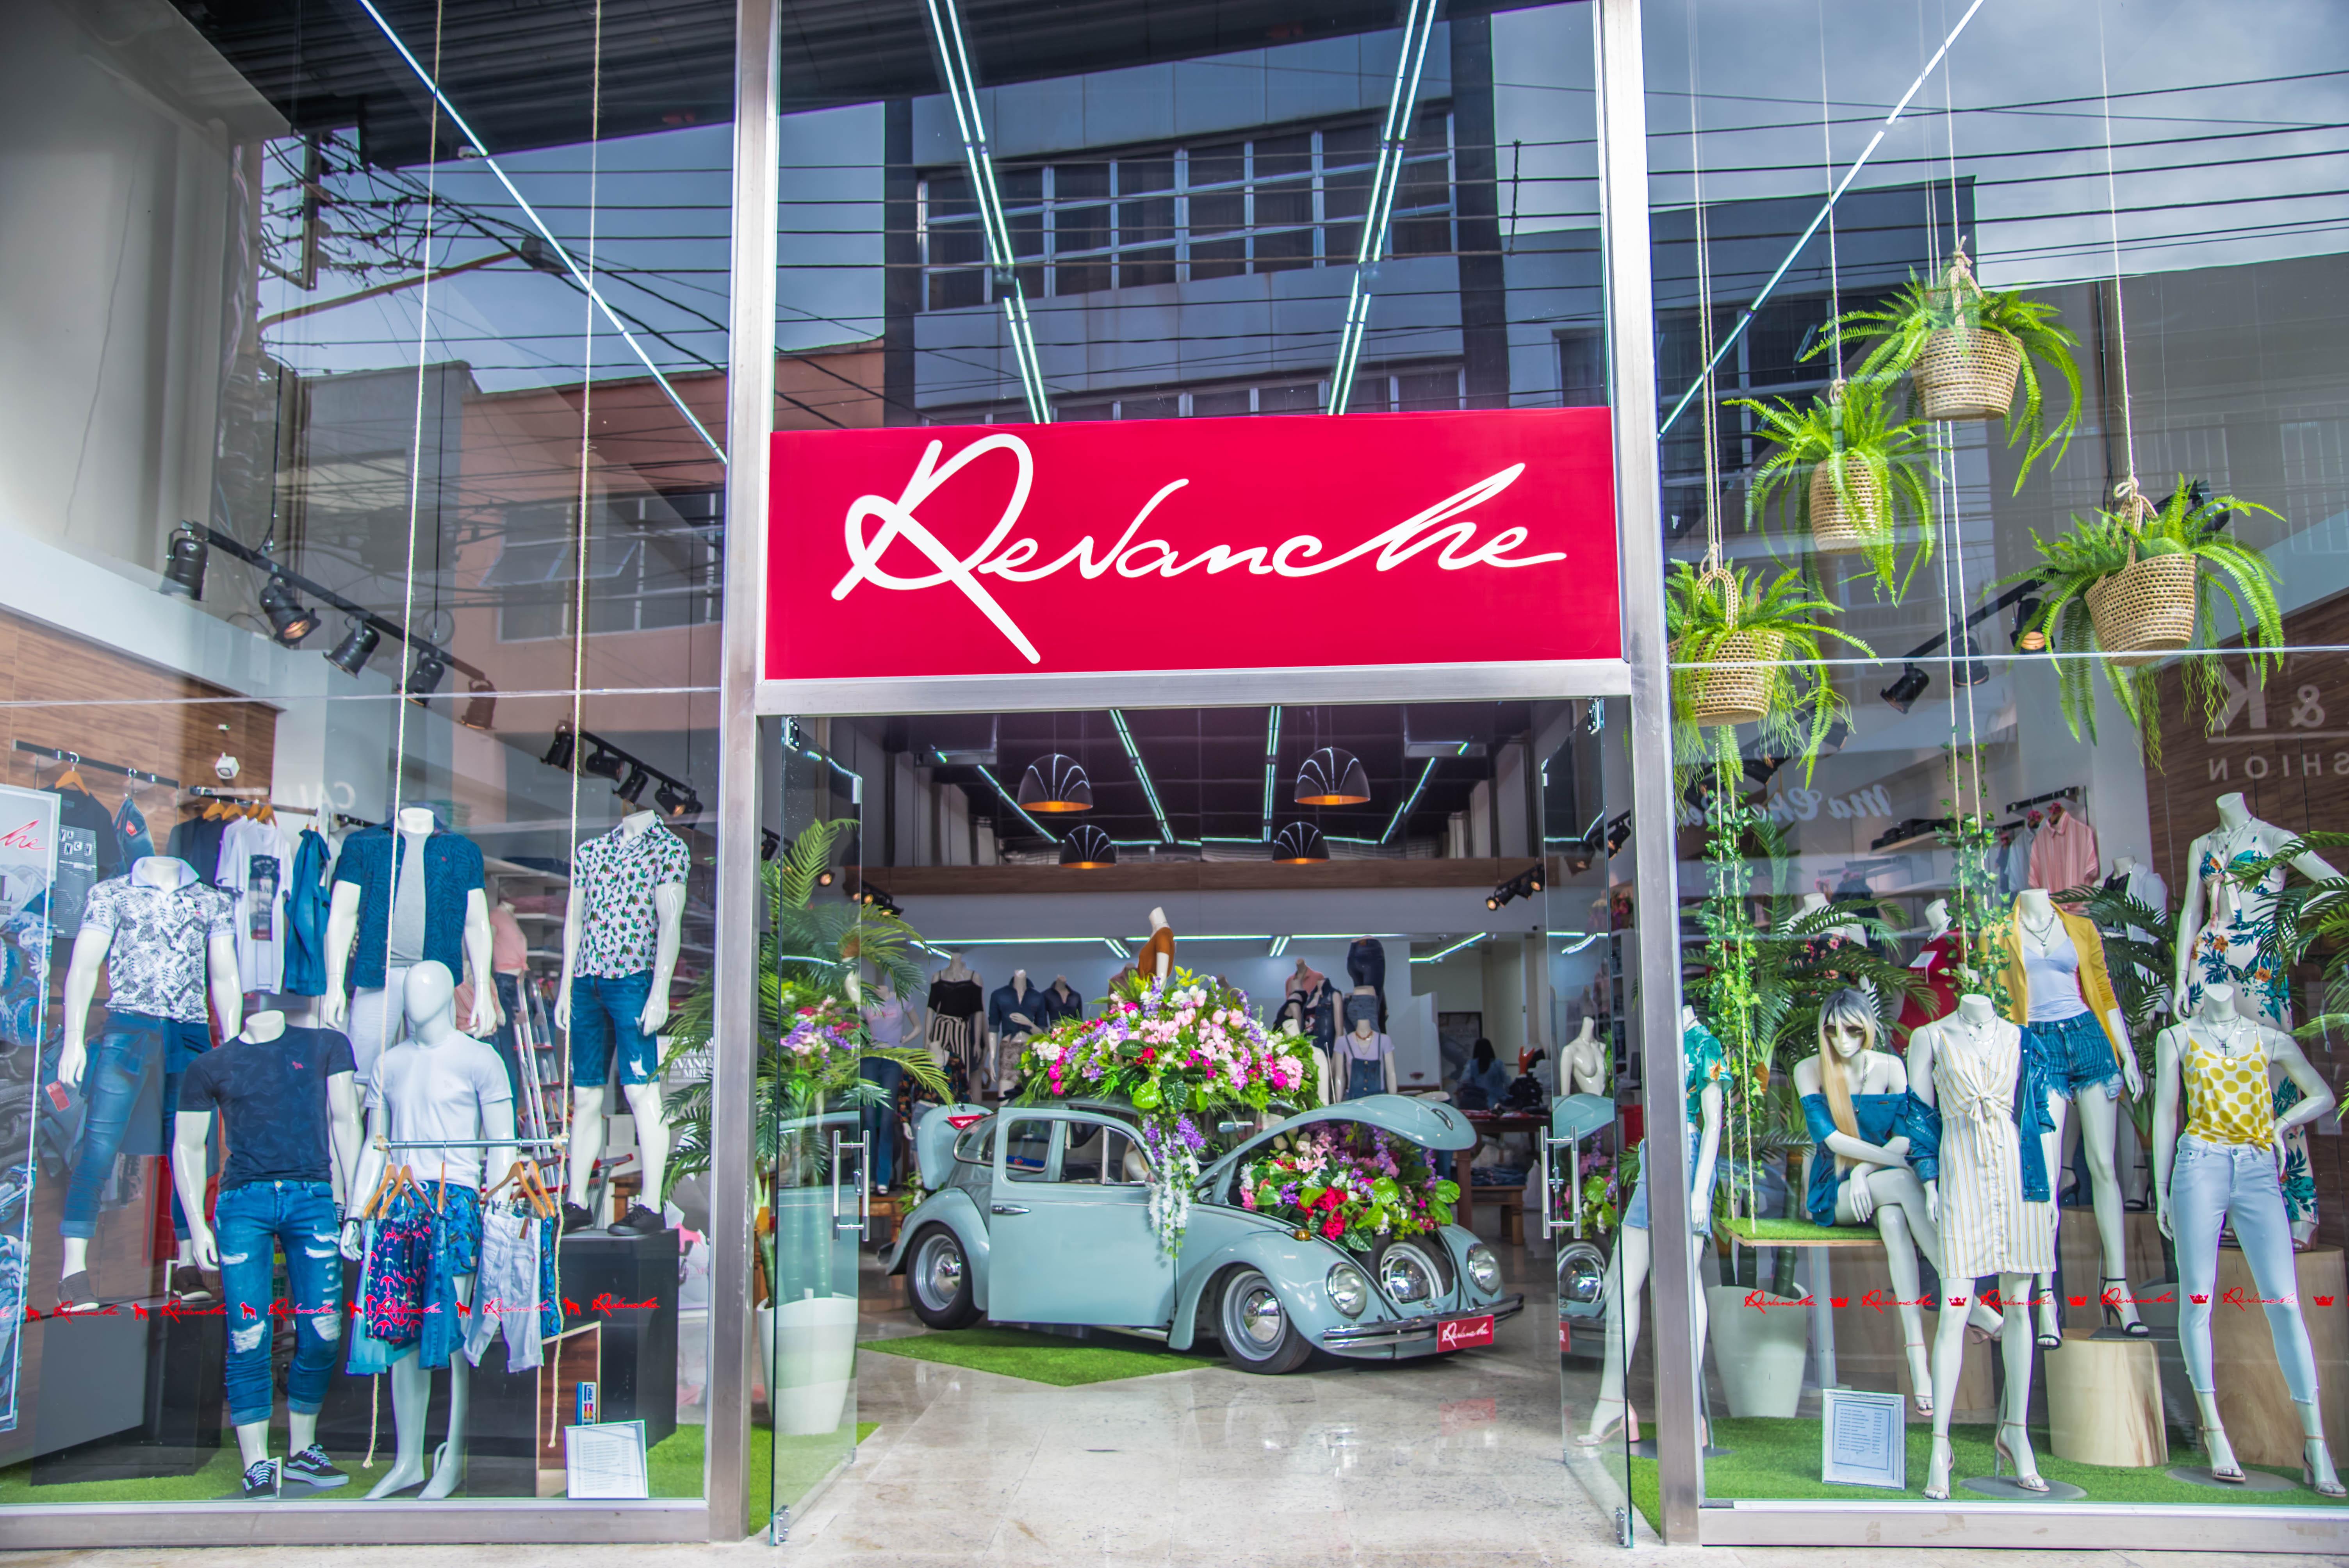 906c9b7d1b Revanche Jeans reinaugura loja no Brás